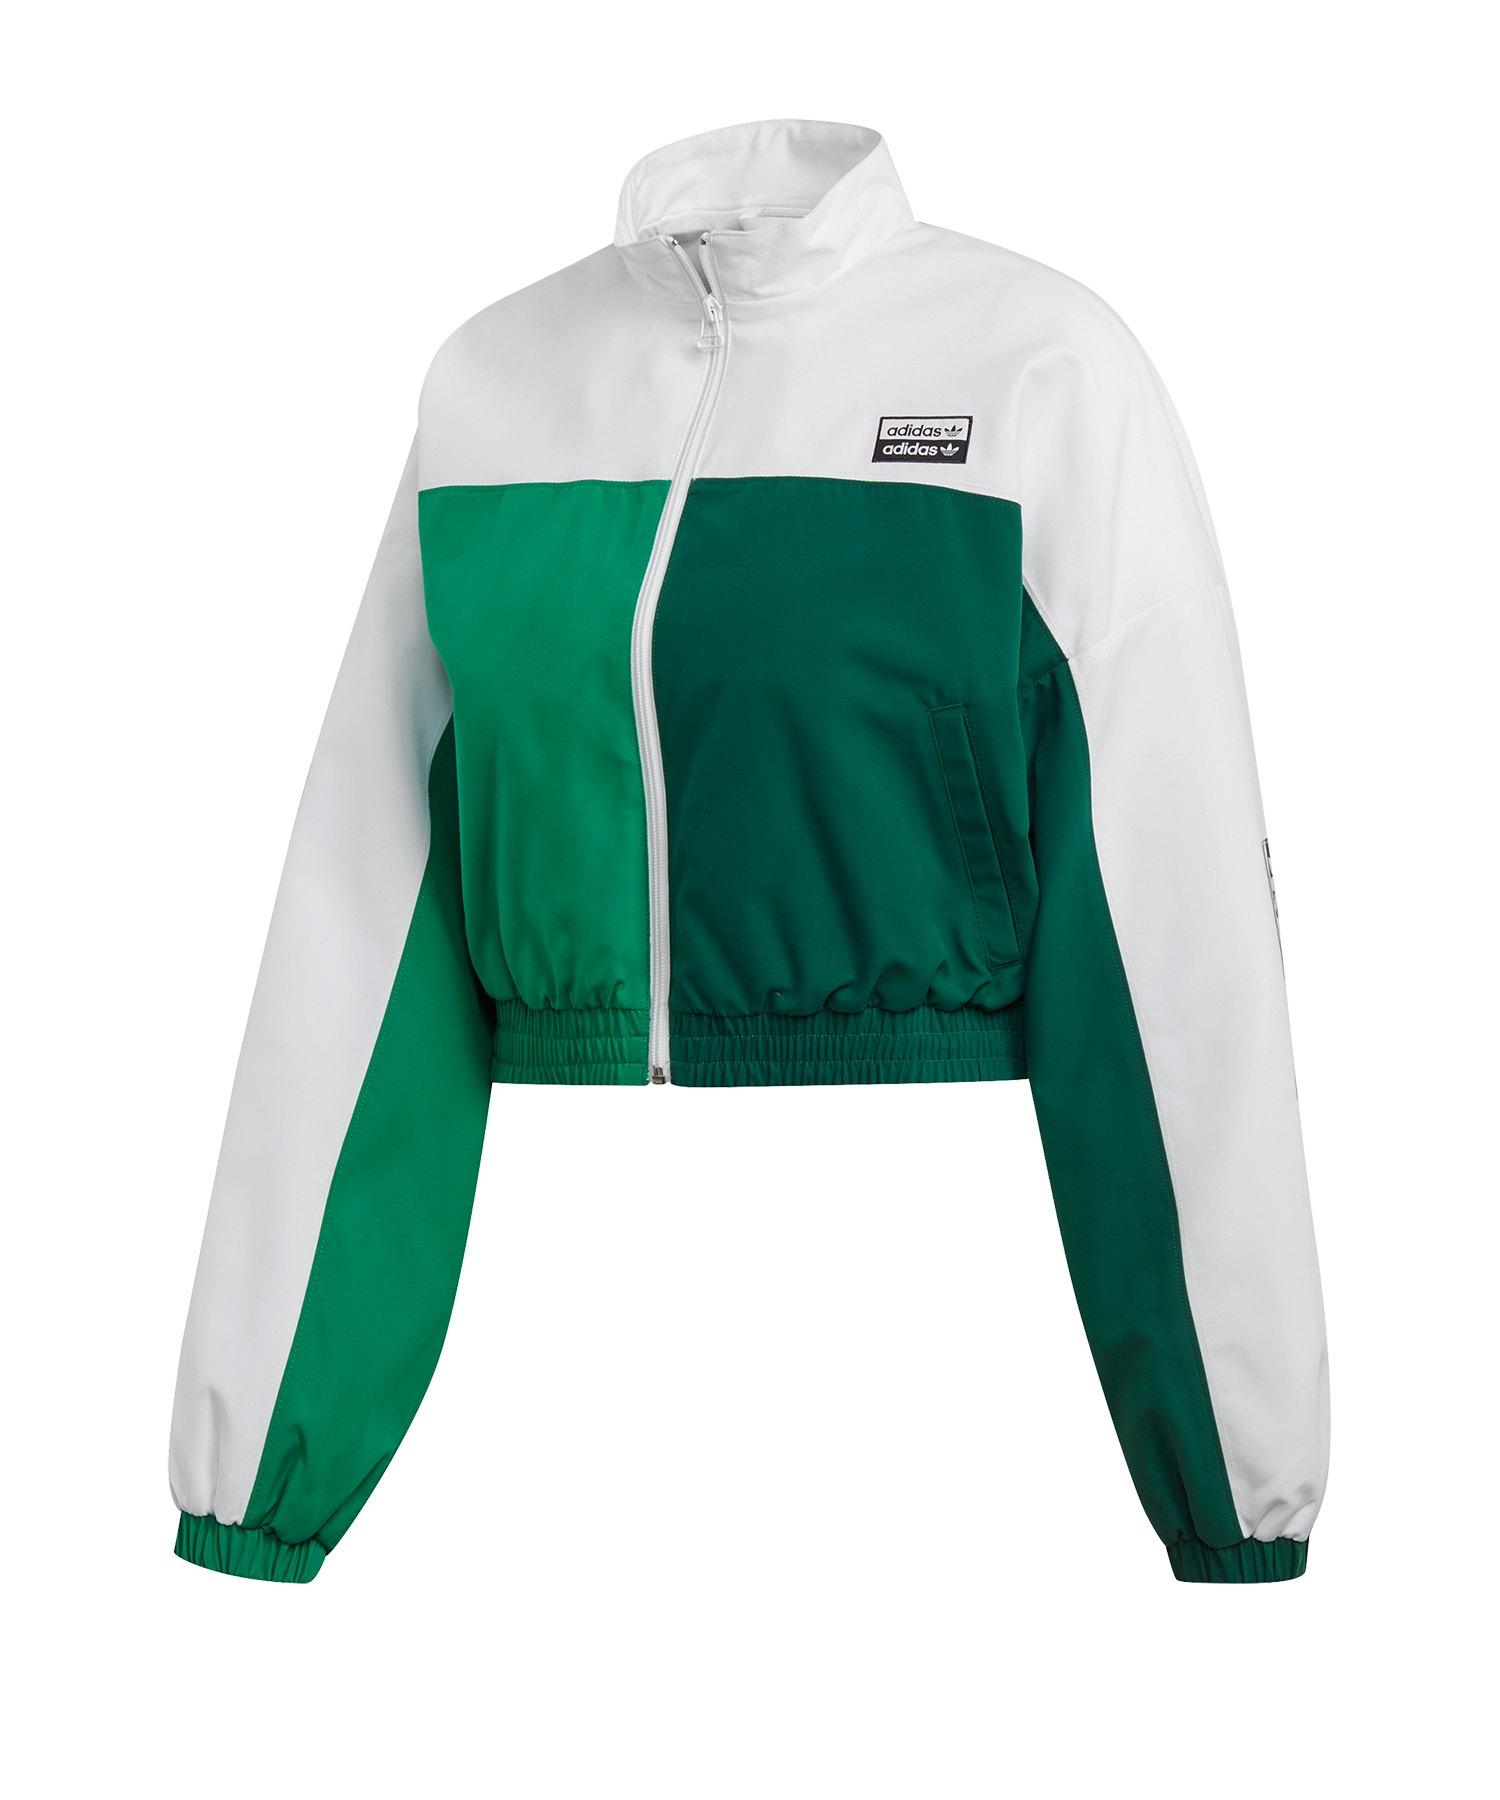 Adidas jacke damen grau – Modische Jacken 2018 2019